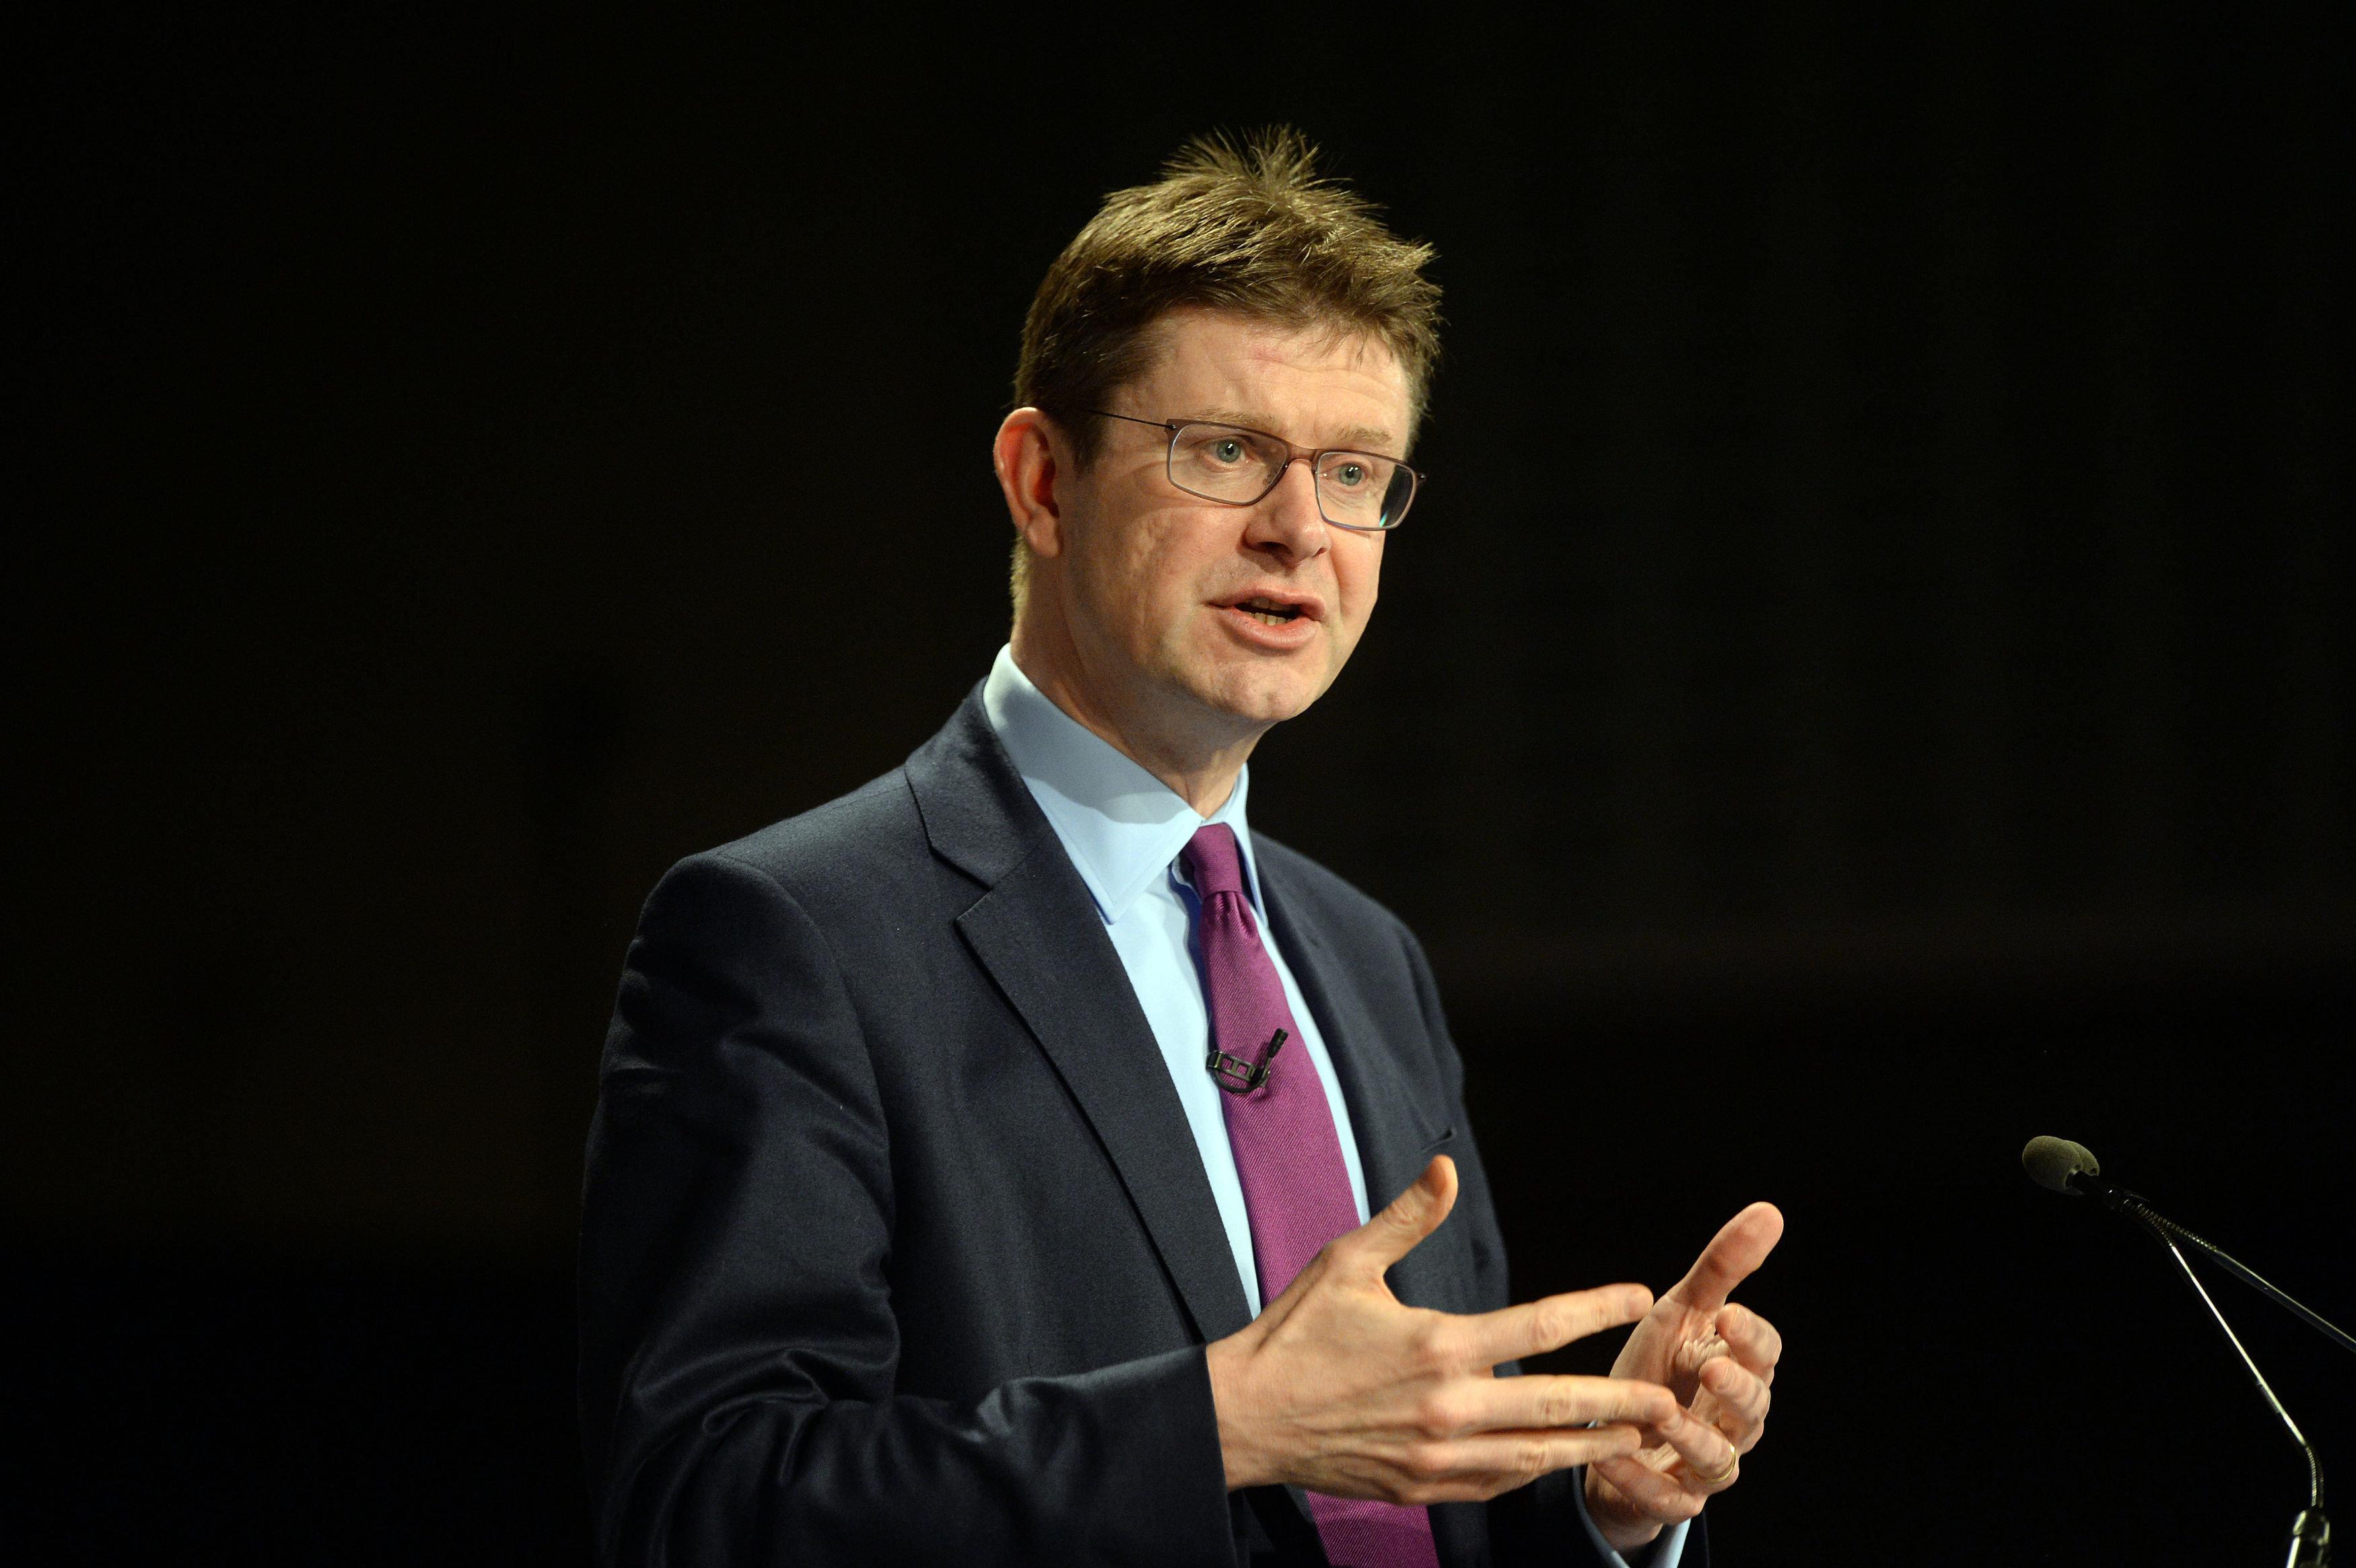 Business Secretary Greg Clark Demands Fast-Track Investigation Into Carillion Directors